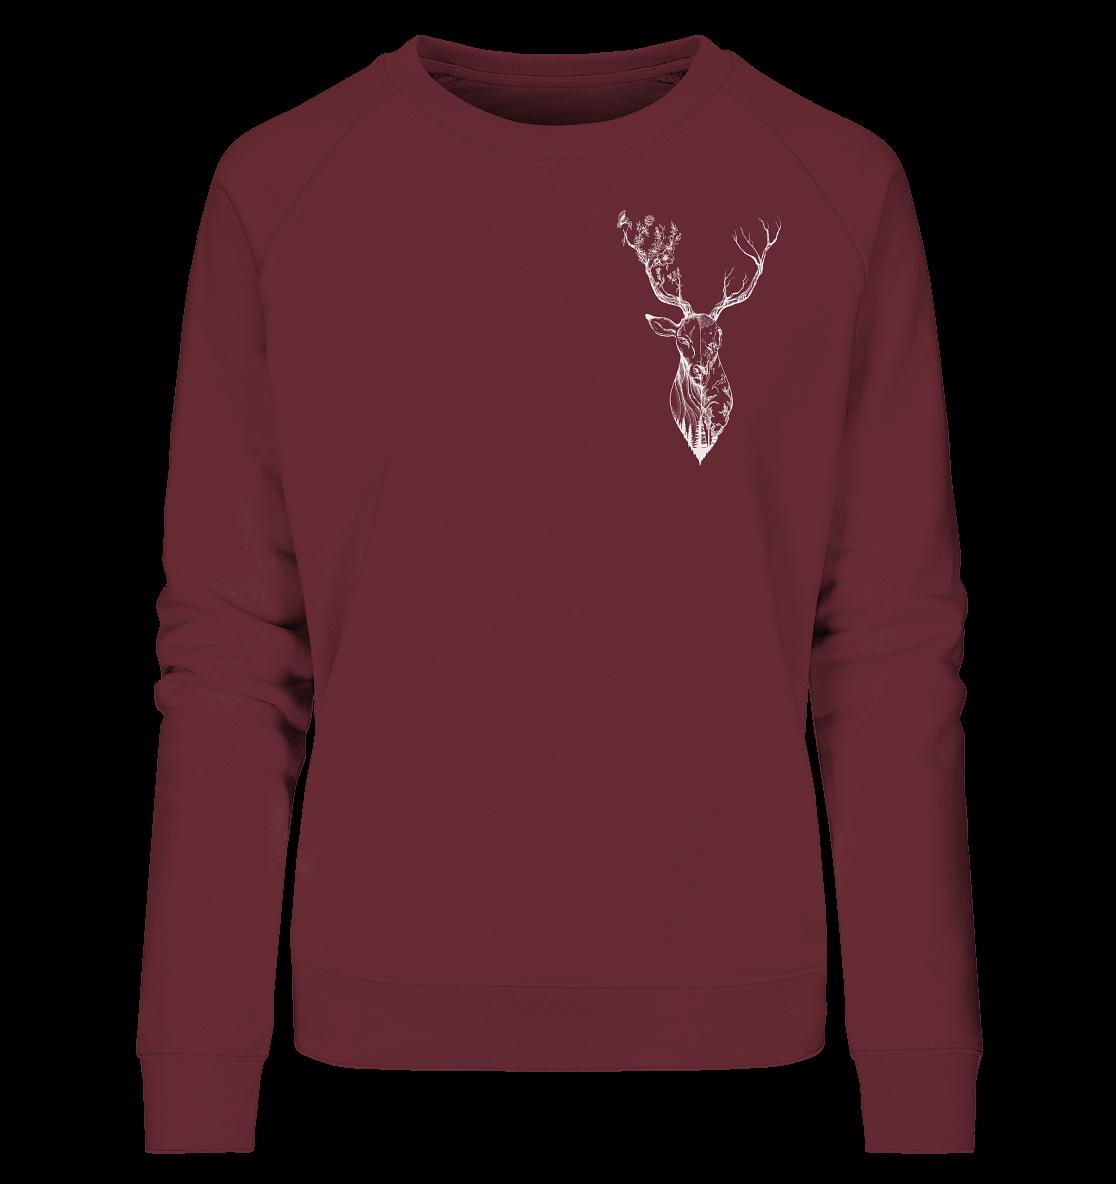 front-ladies-organic-sweatshirt-672b34-1116x-6.png